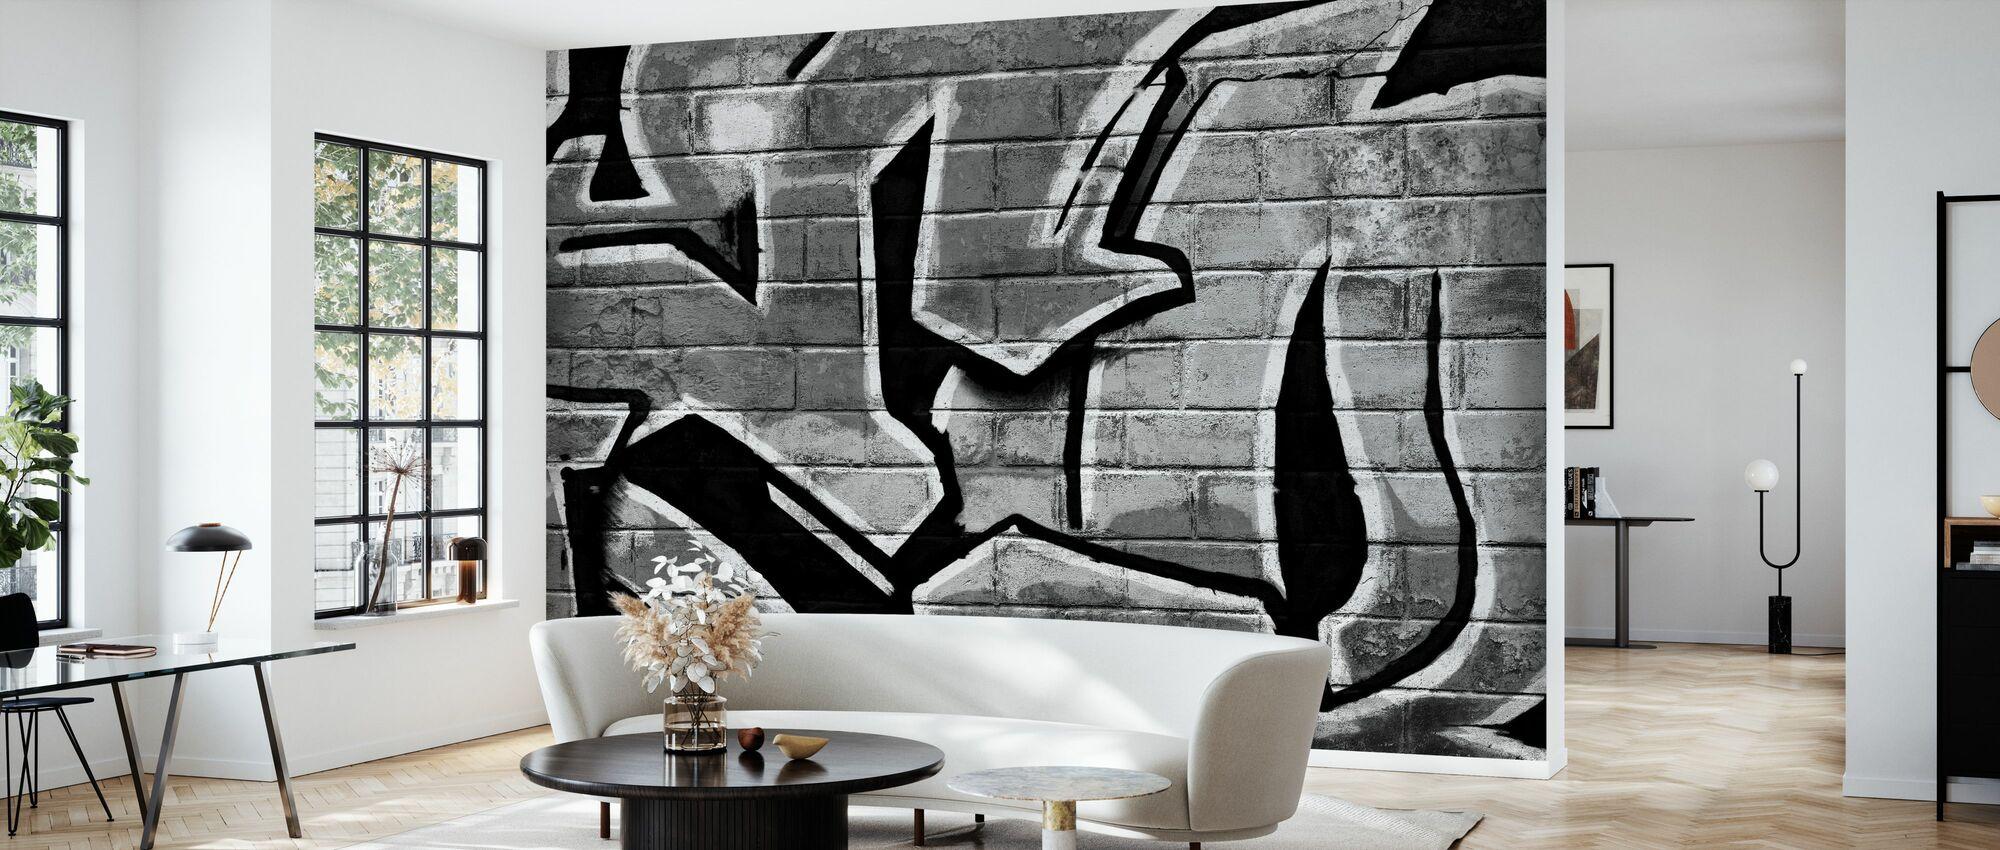 Graffiti Brick Wall - Bw - Wallpaper - Living Room